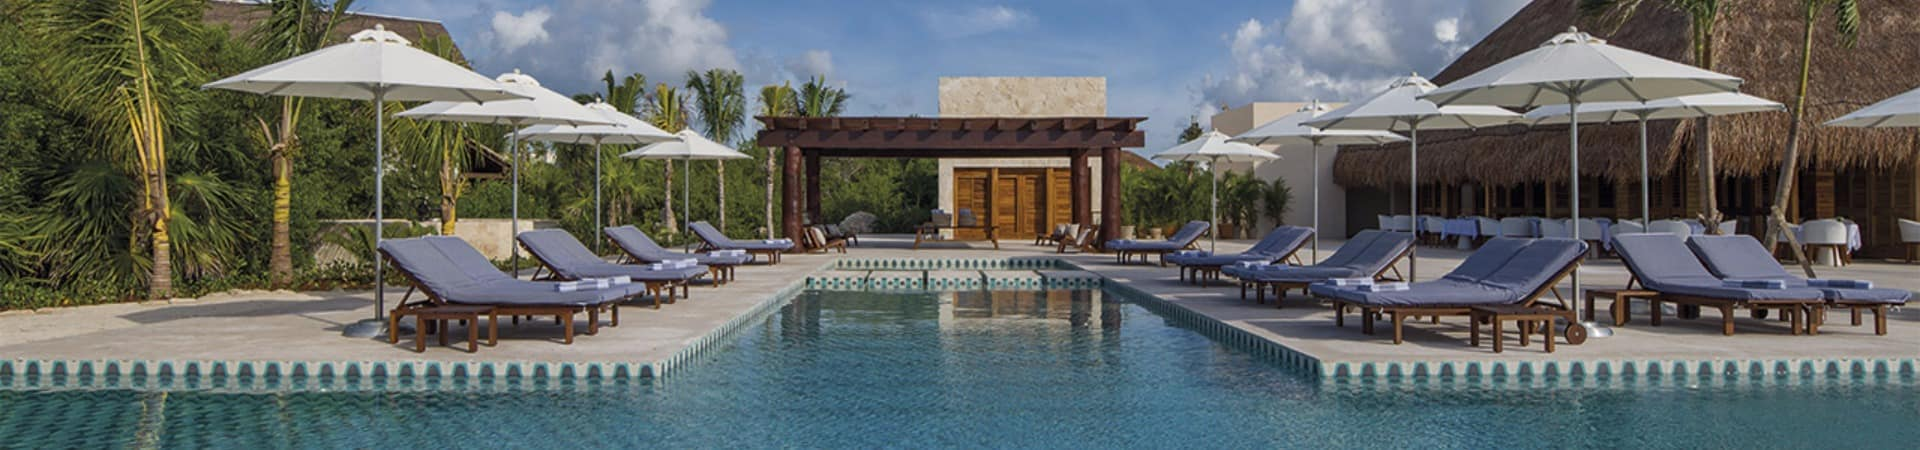 Chablemaroma piscina